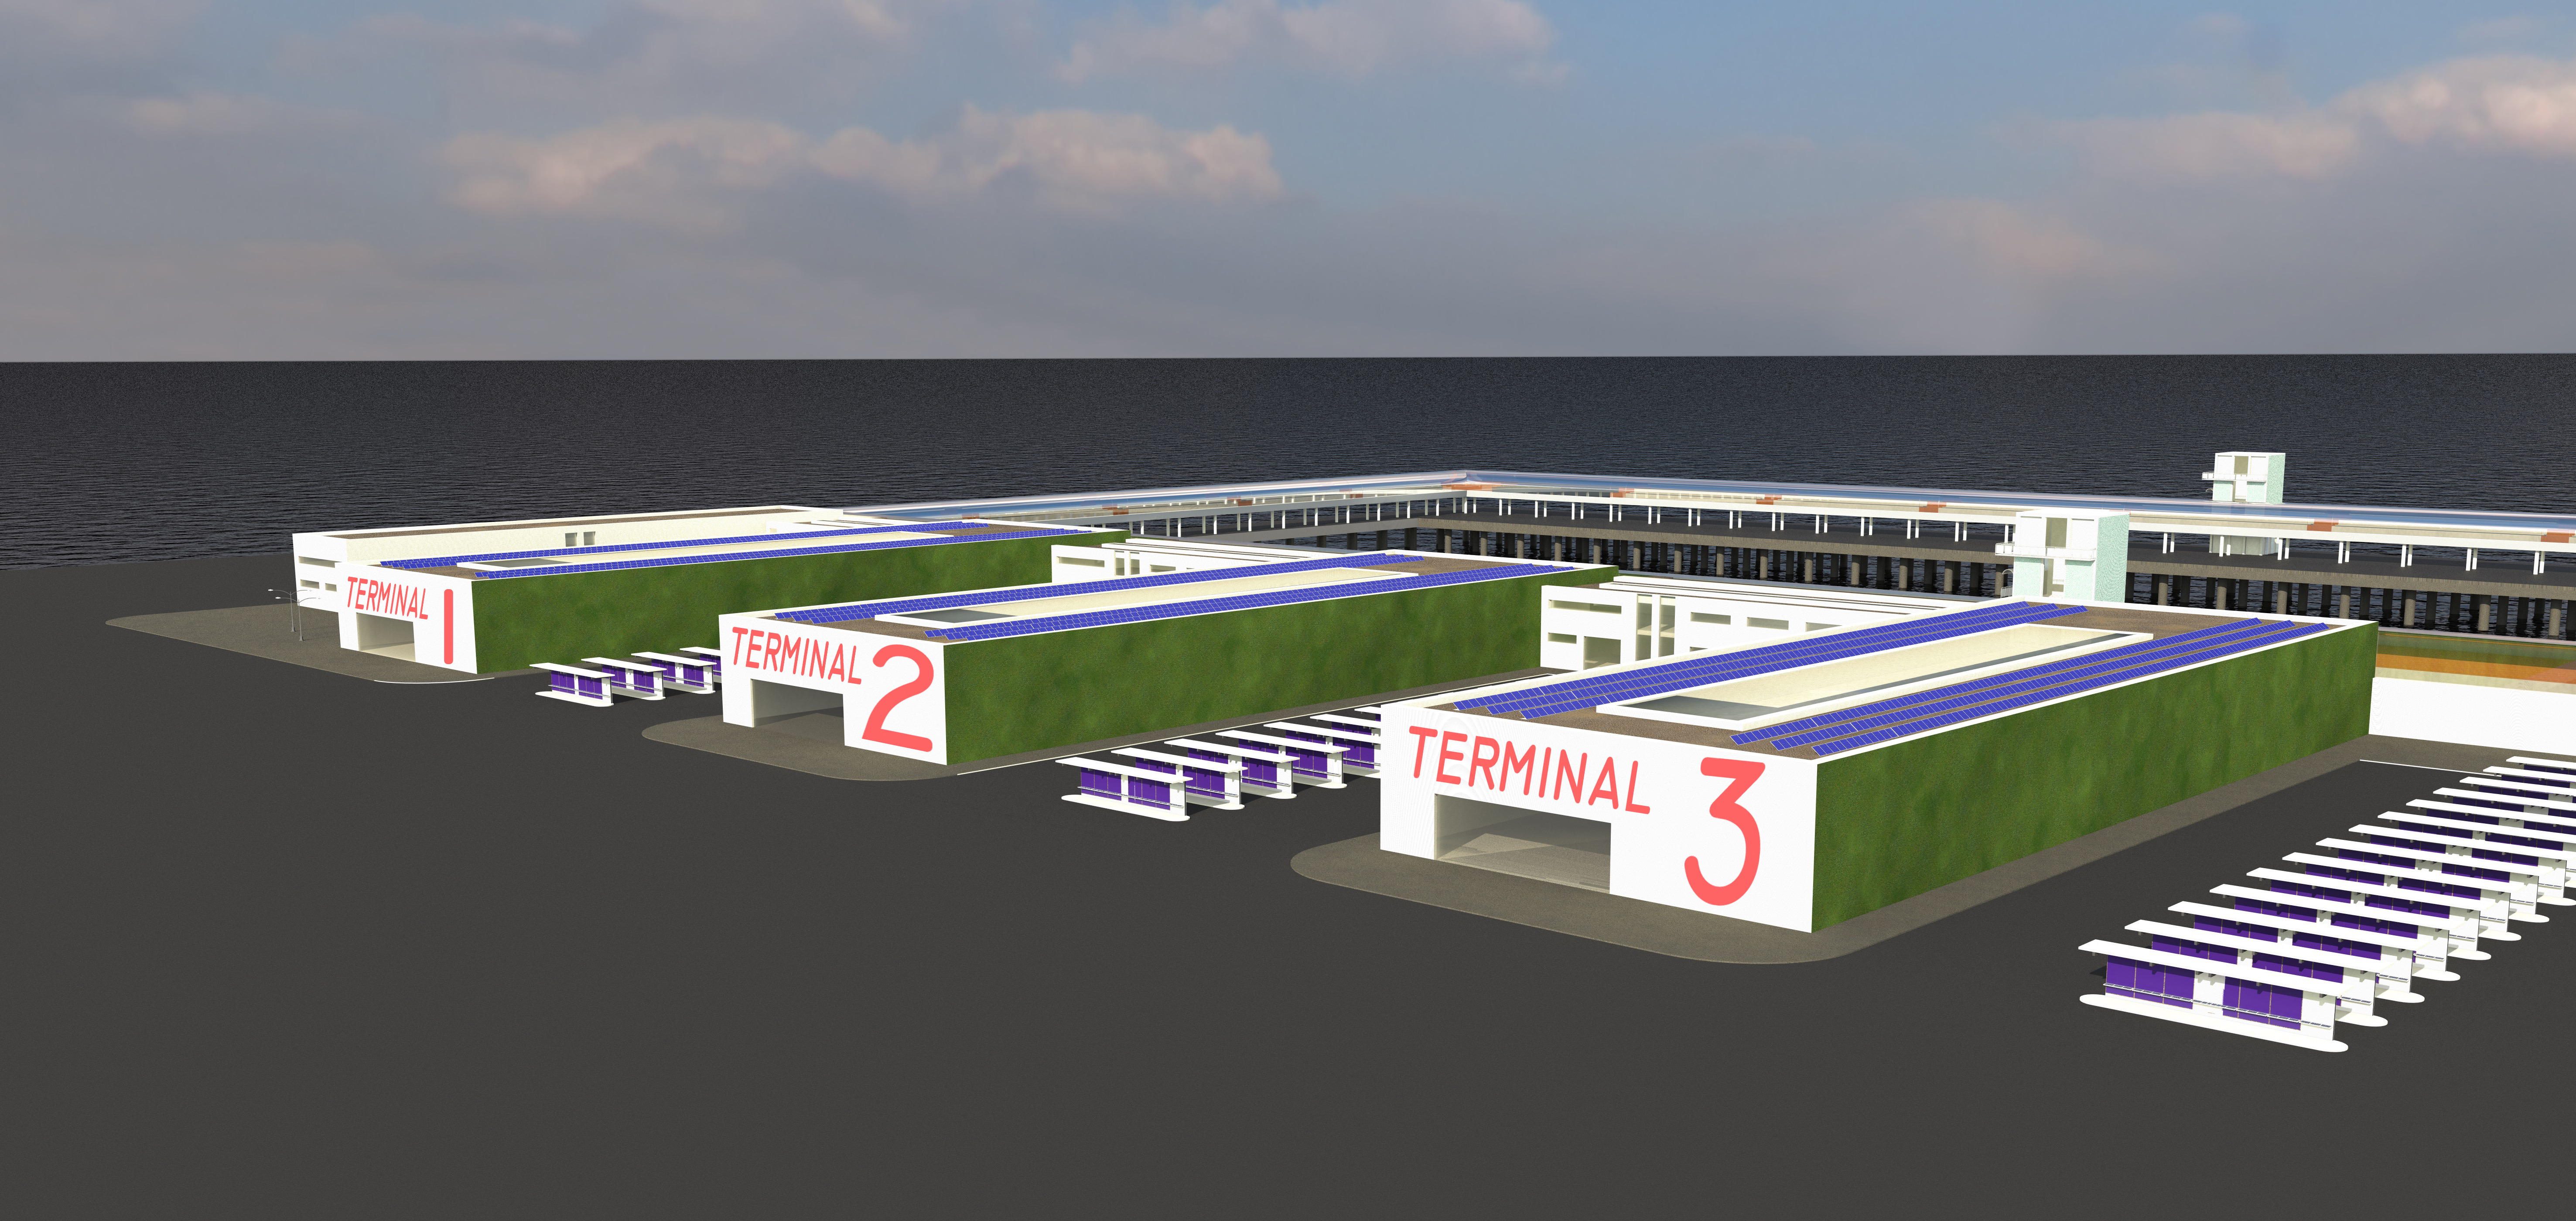 Terminal 1-3